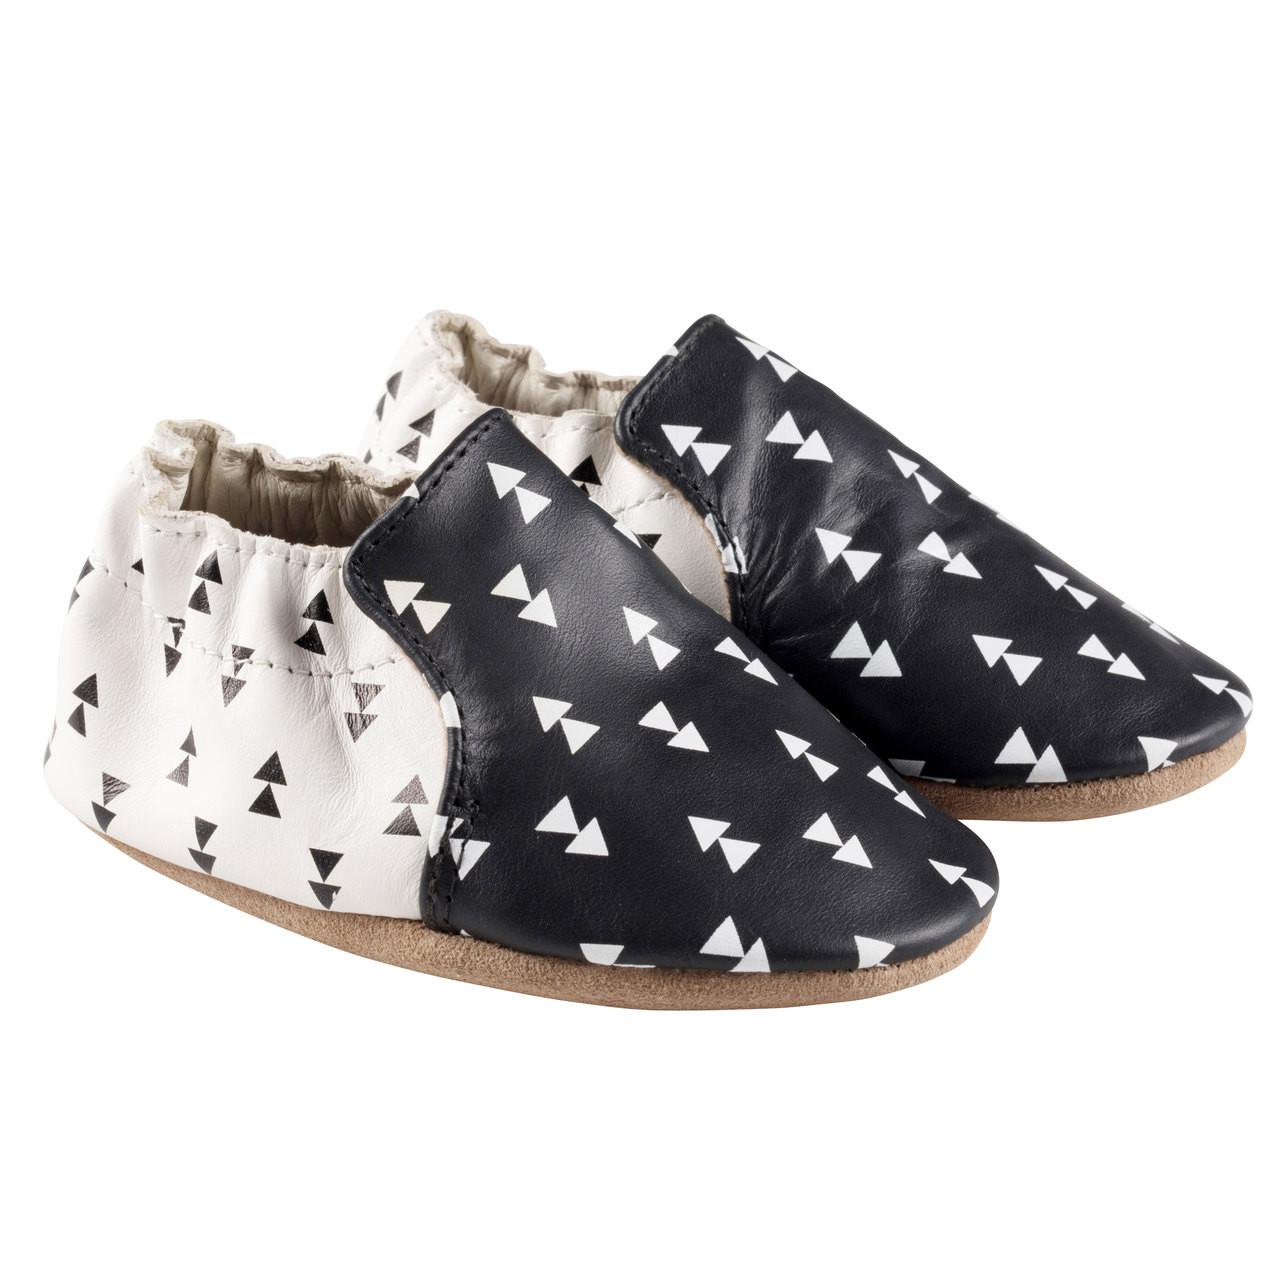 Beau   Soft Soles   Baby Shoes   Robeez